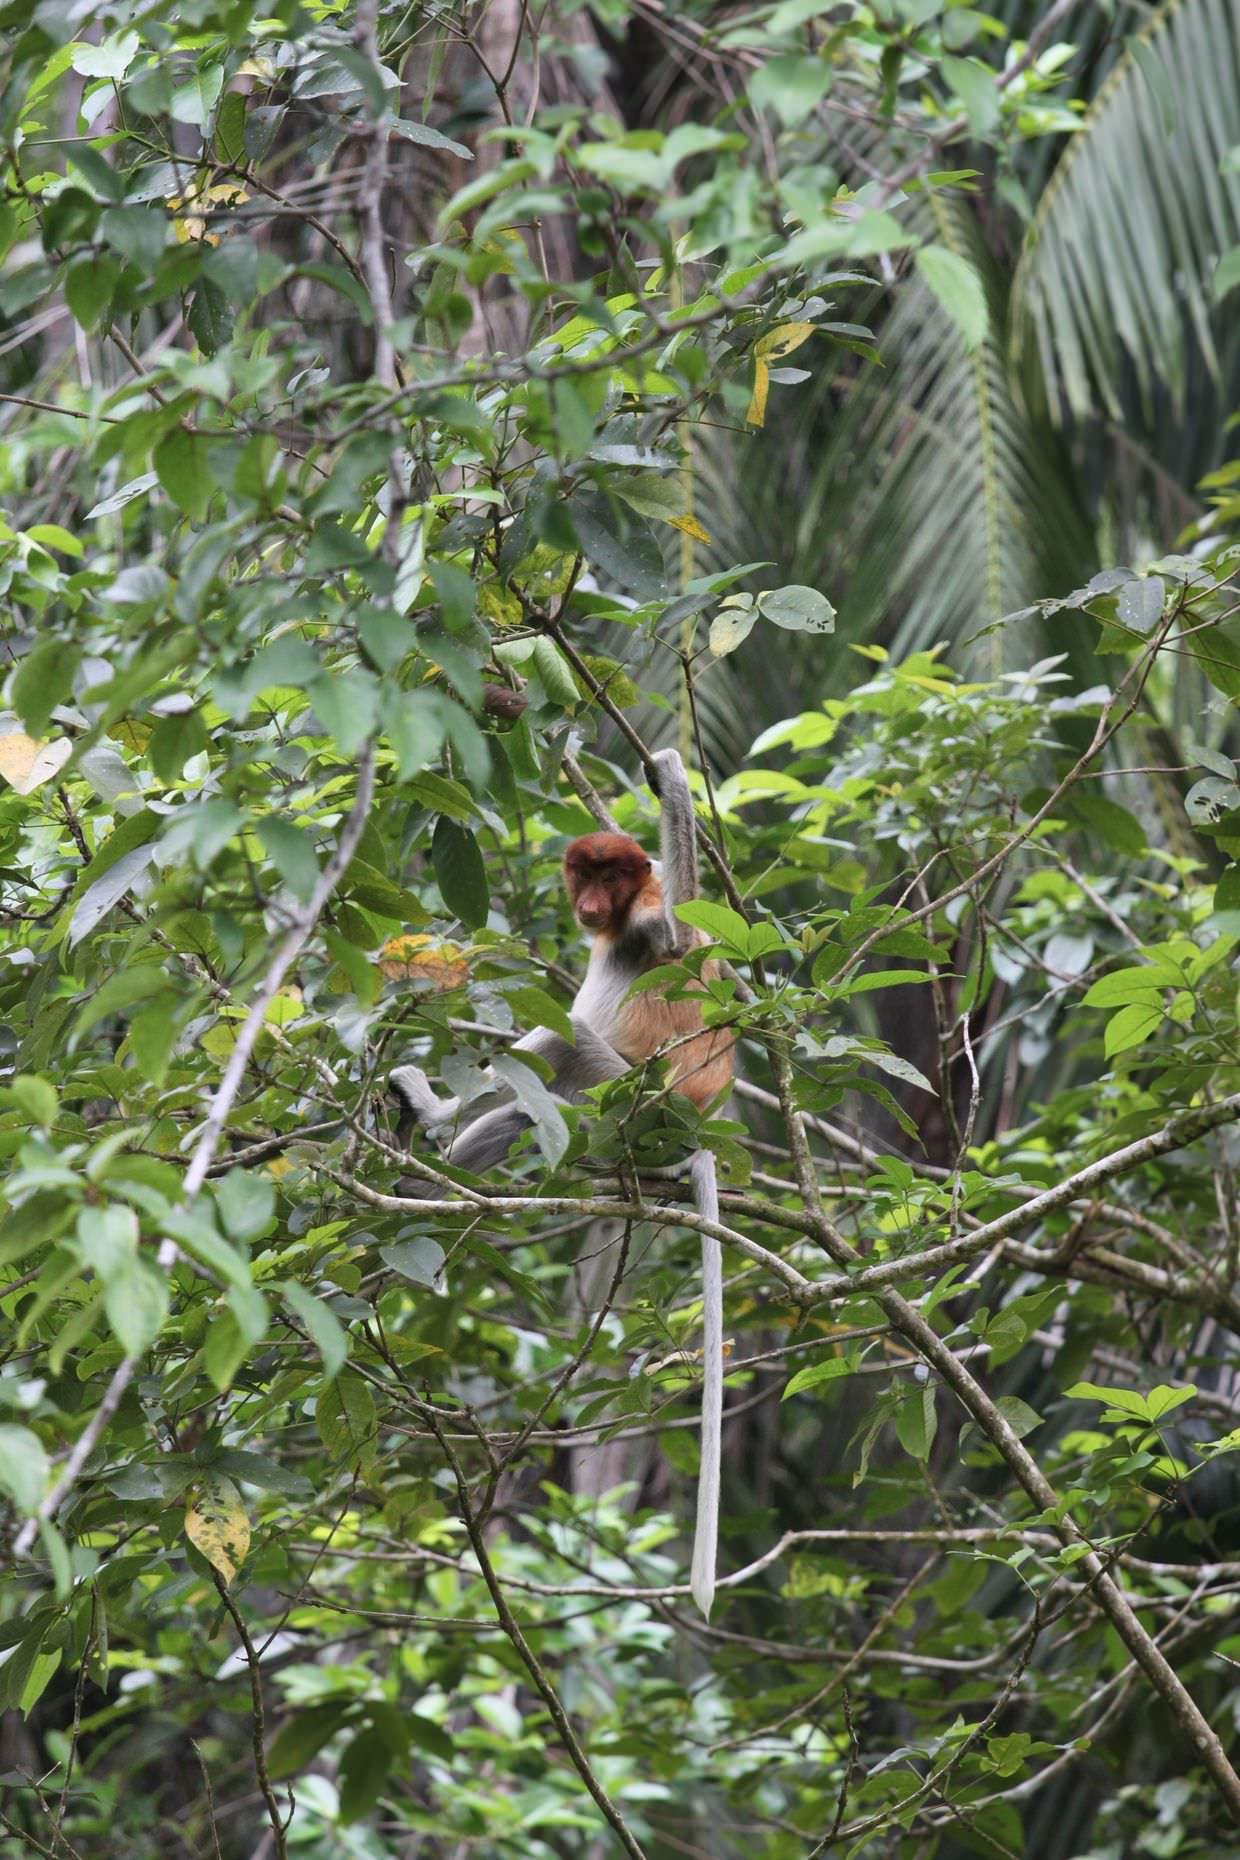 Female proboscis monkey in a tree